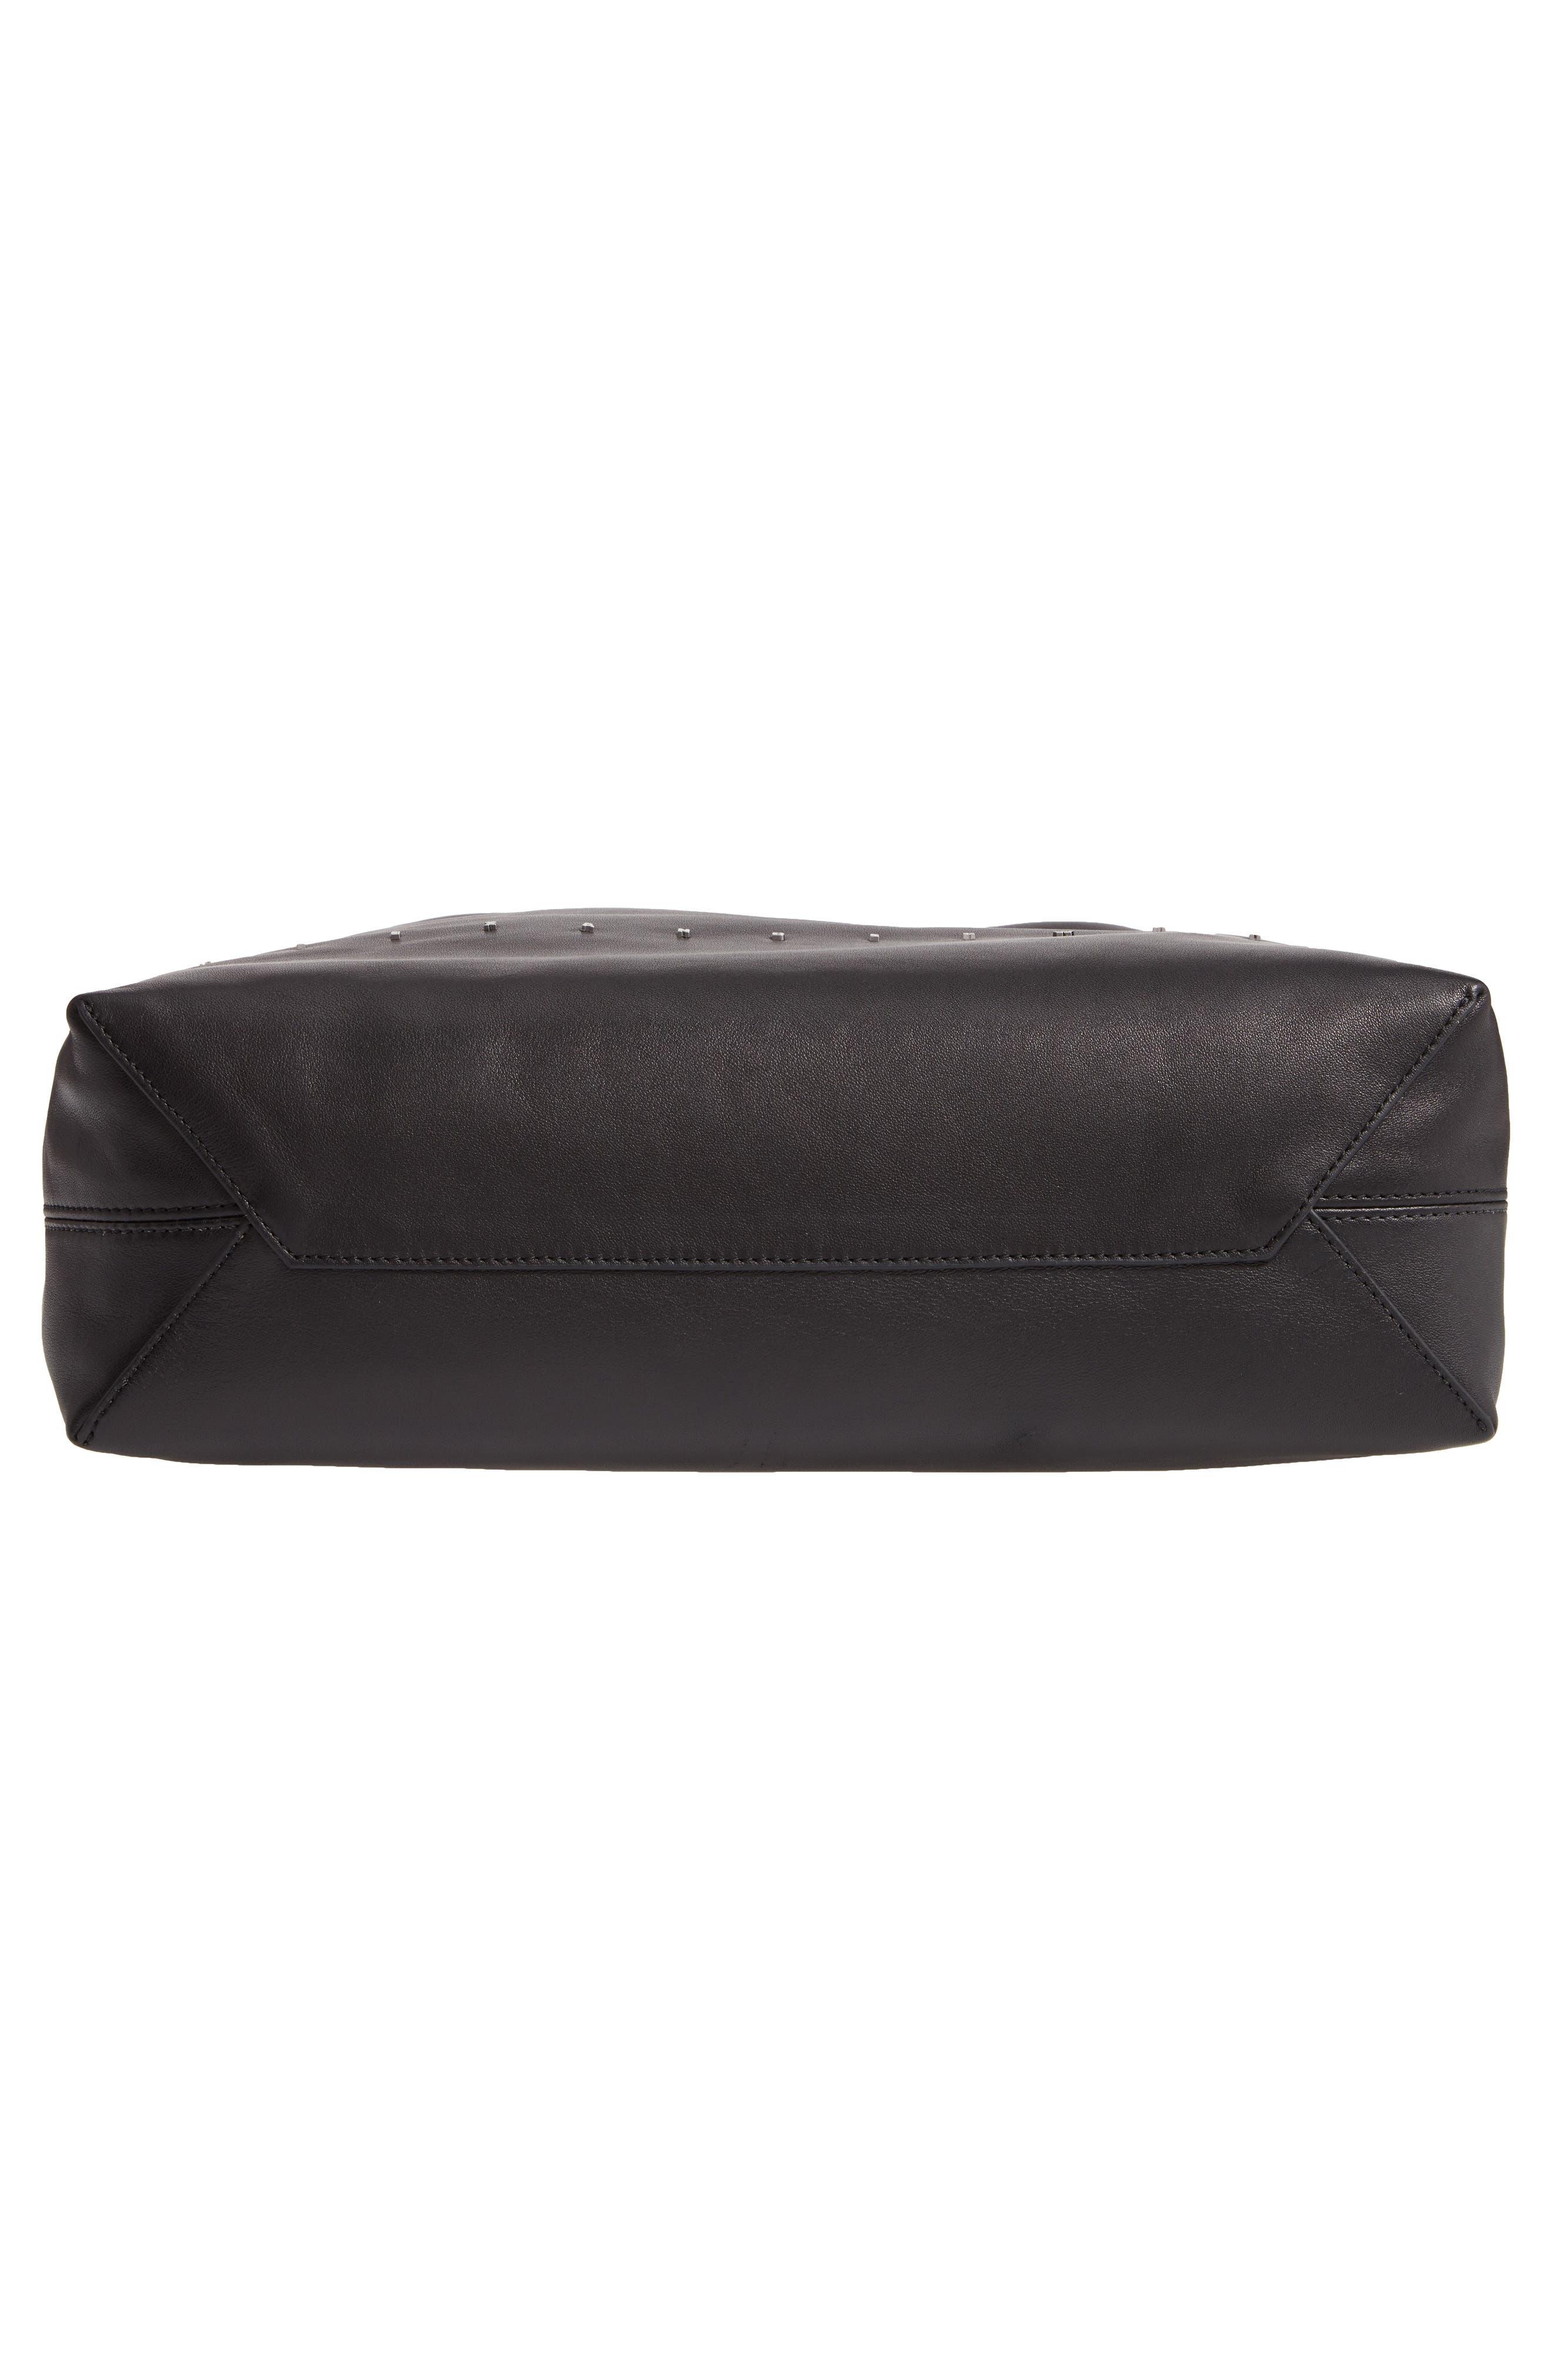 Wefty Drawstring Bucket Bag,                             Alternate thumbnail 6, color,                             BLACK